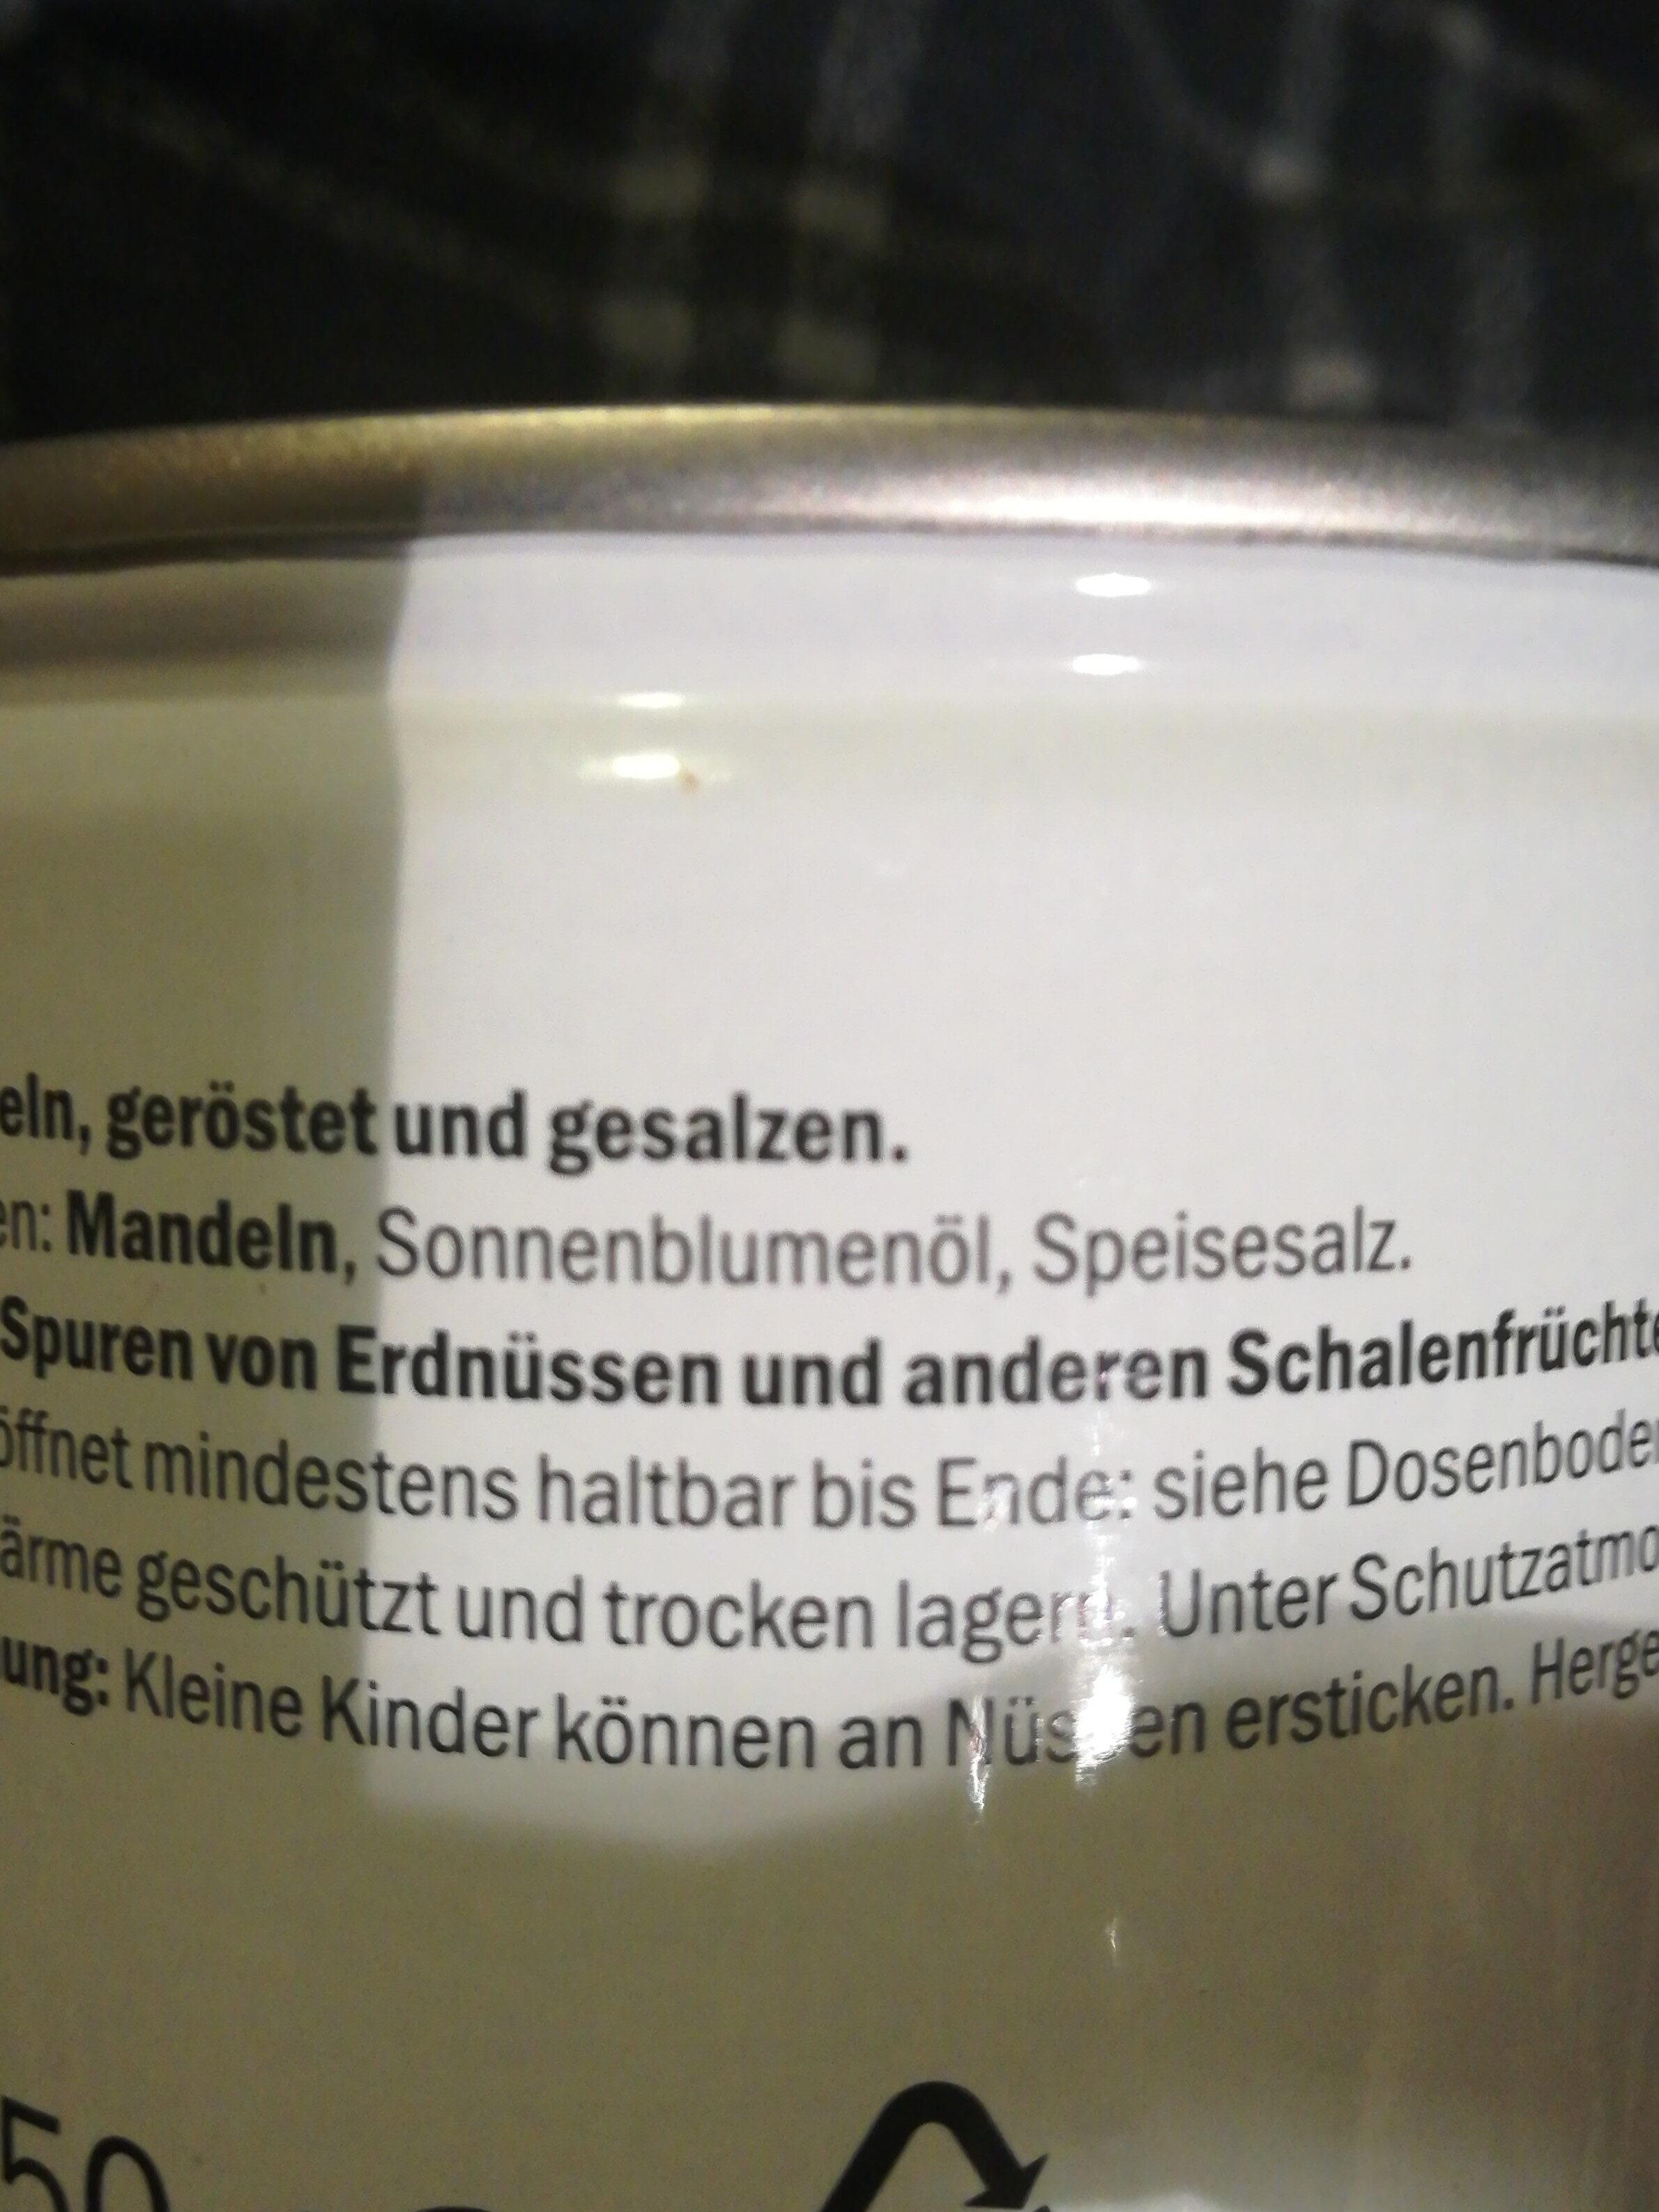 Geröstete Mandeln - Ingrédients - de